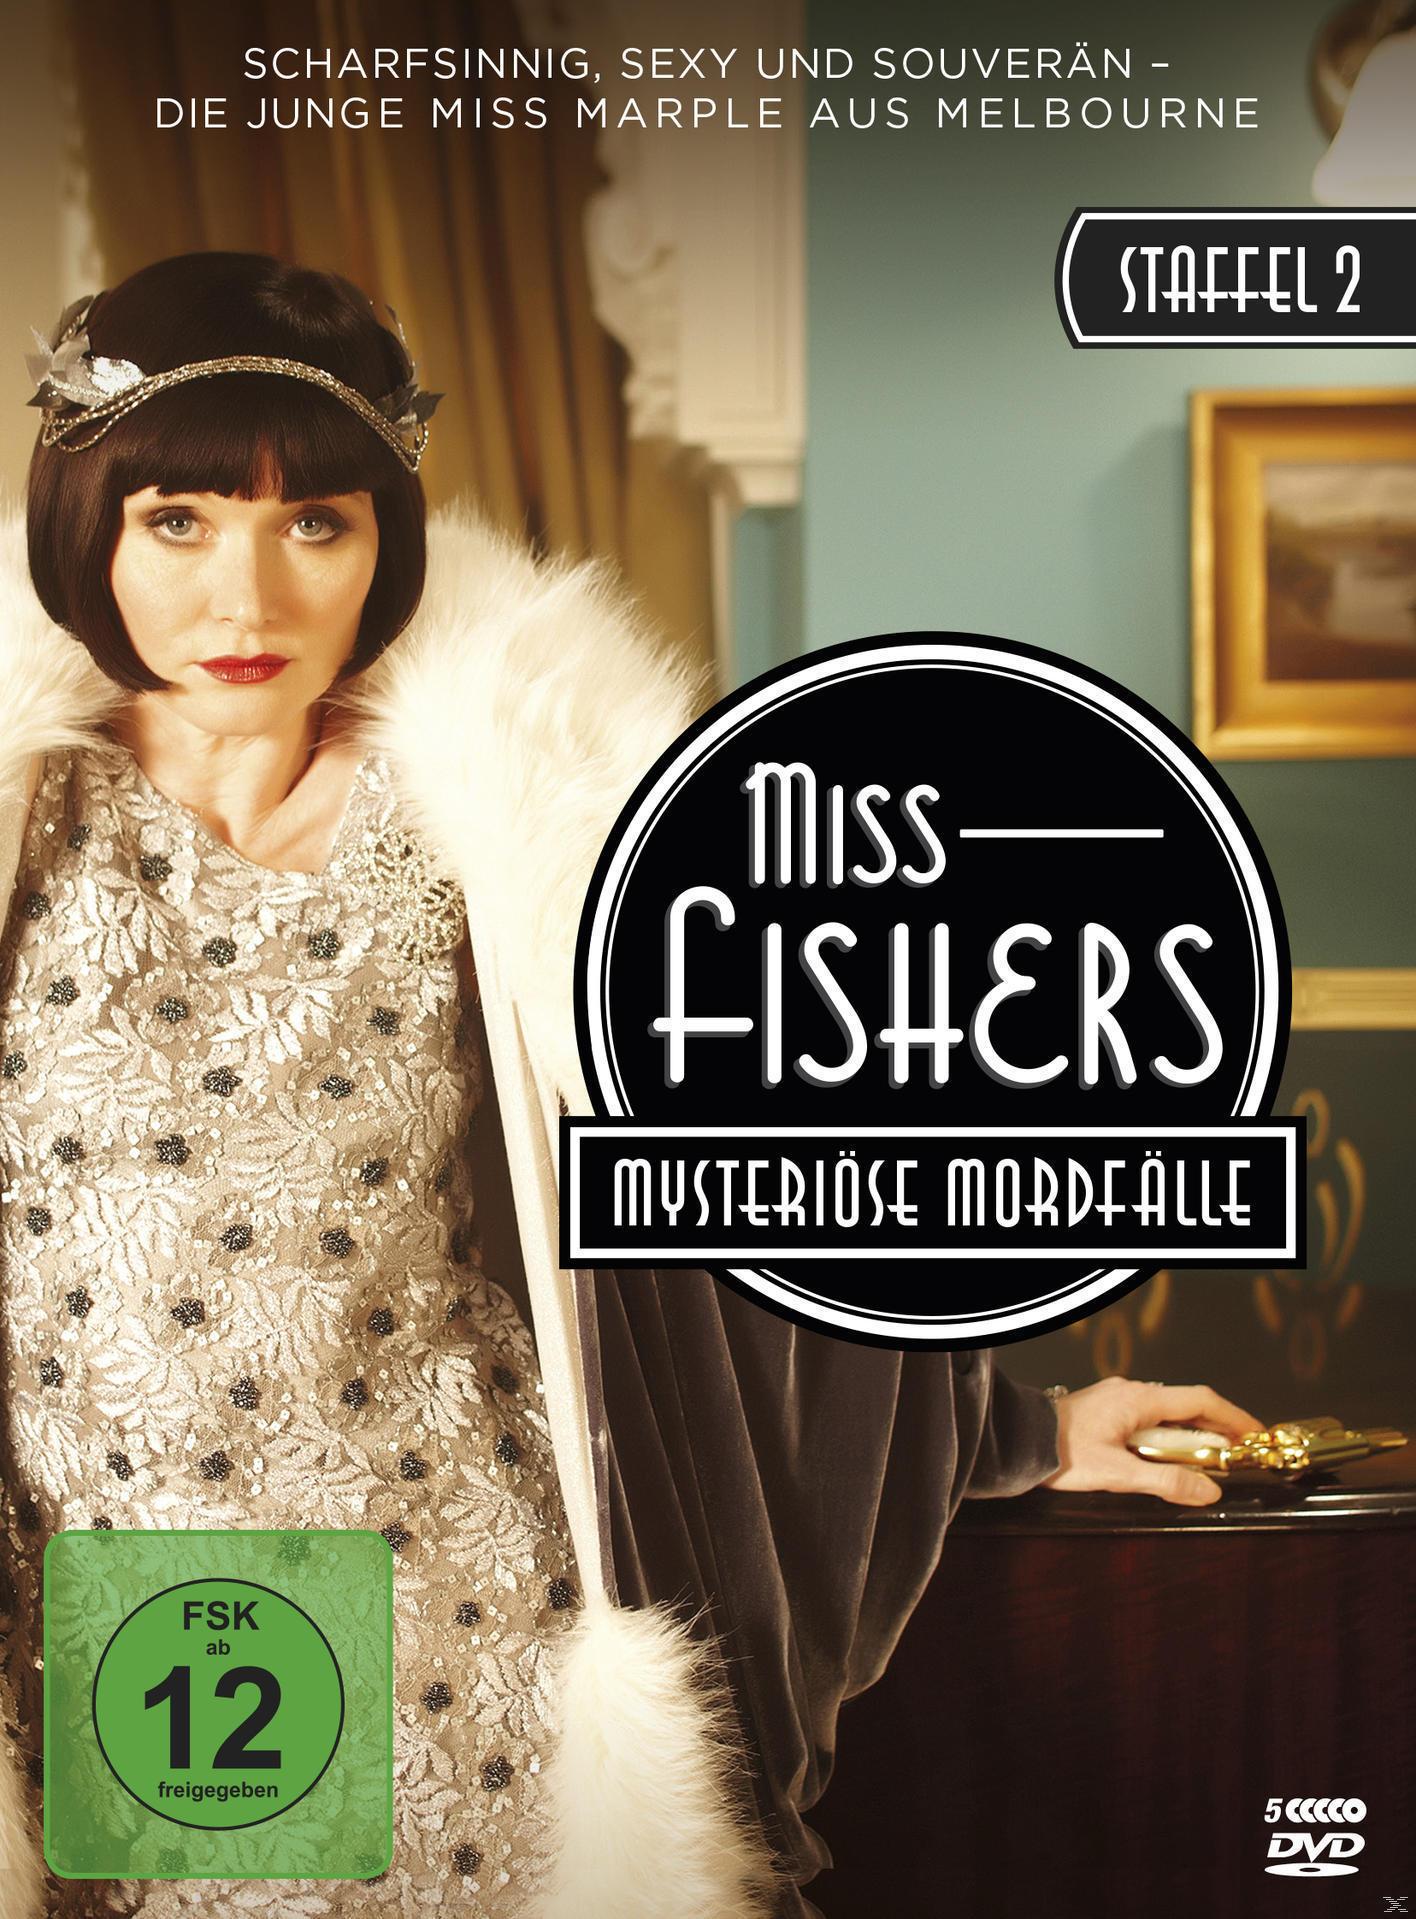 Miss Fishers mysteriöse Mordfälle - Staffel 2 DVD-Box (DVD) für 16,99 Euro